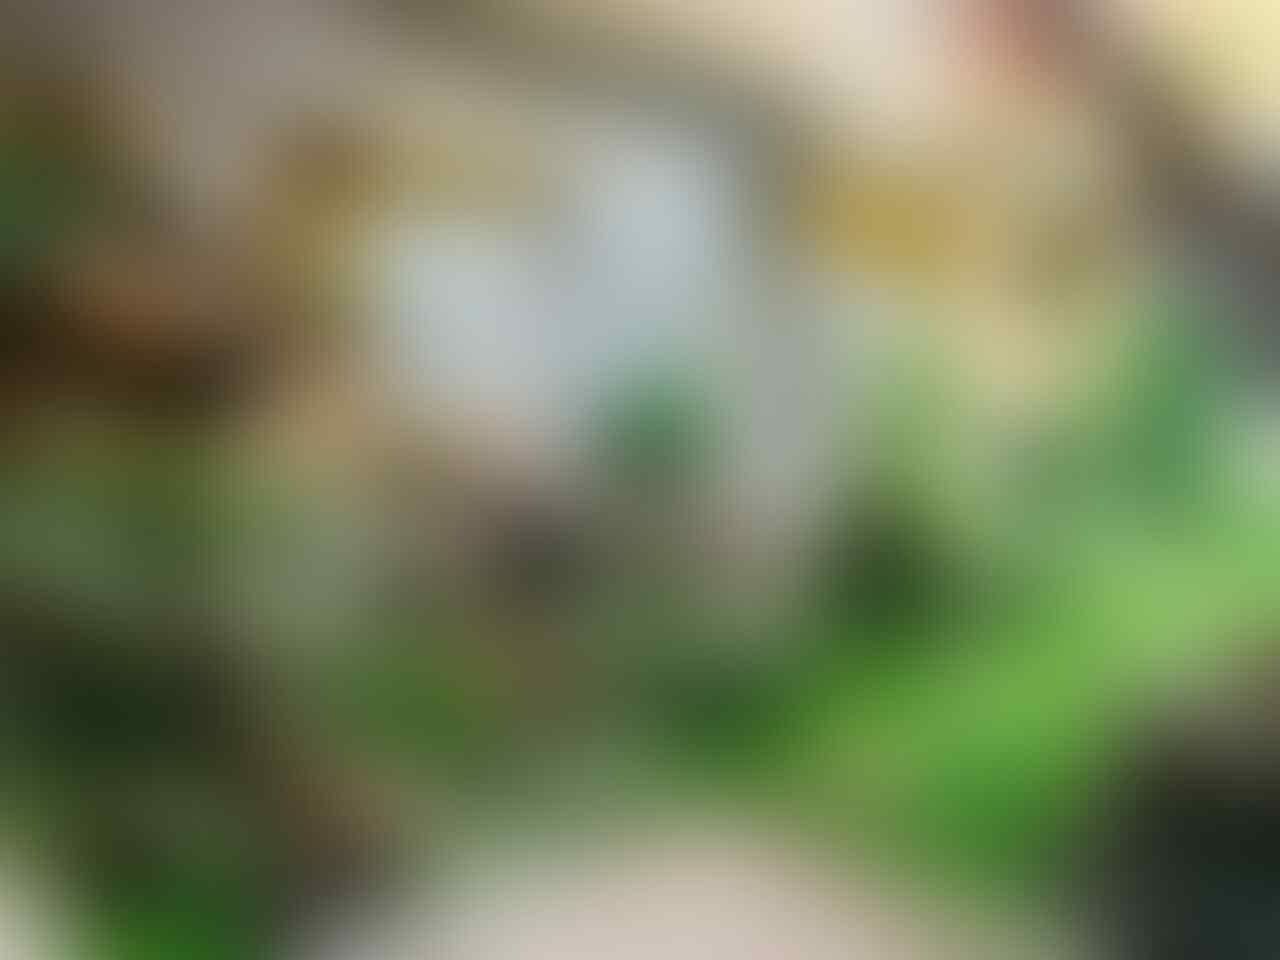 Forum Koi Kaskus Part 5 (Semua Tentang Koi Masuk Kesini)